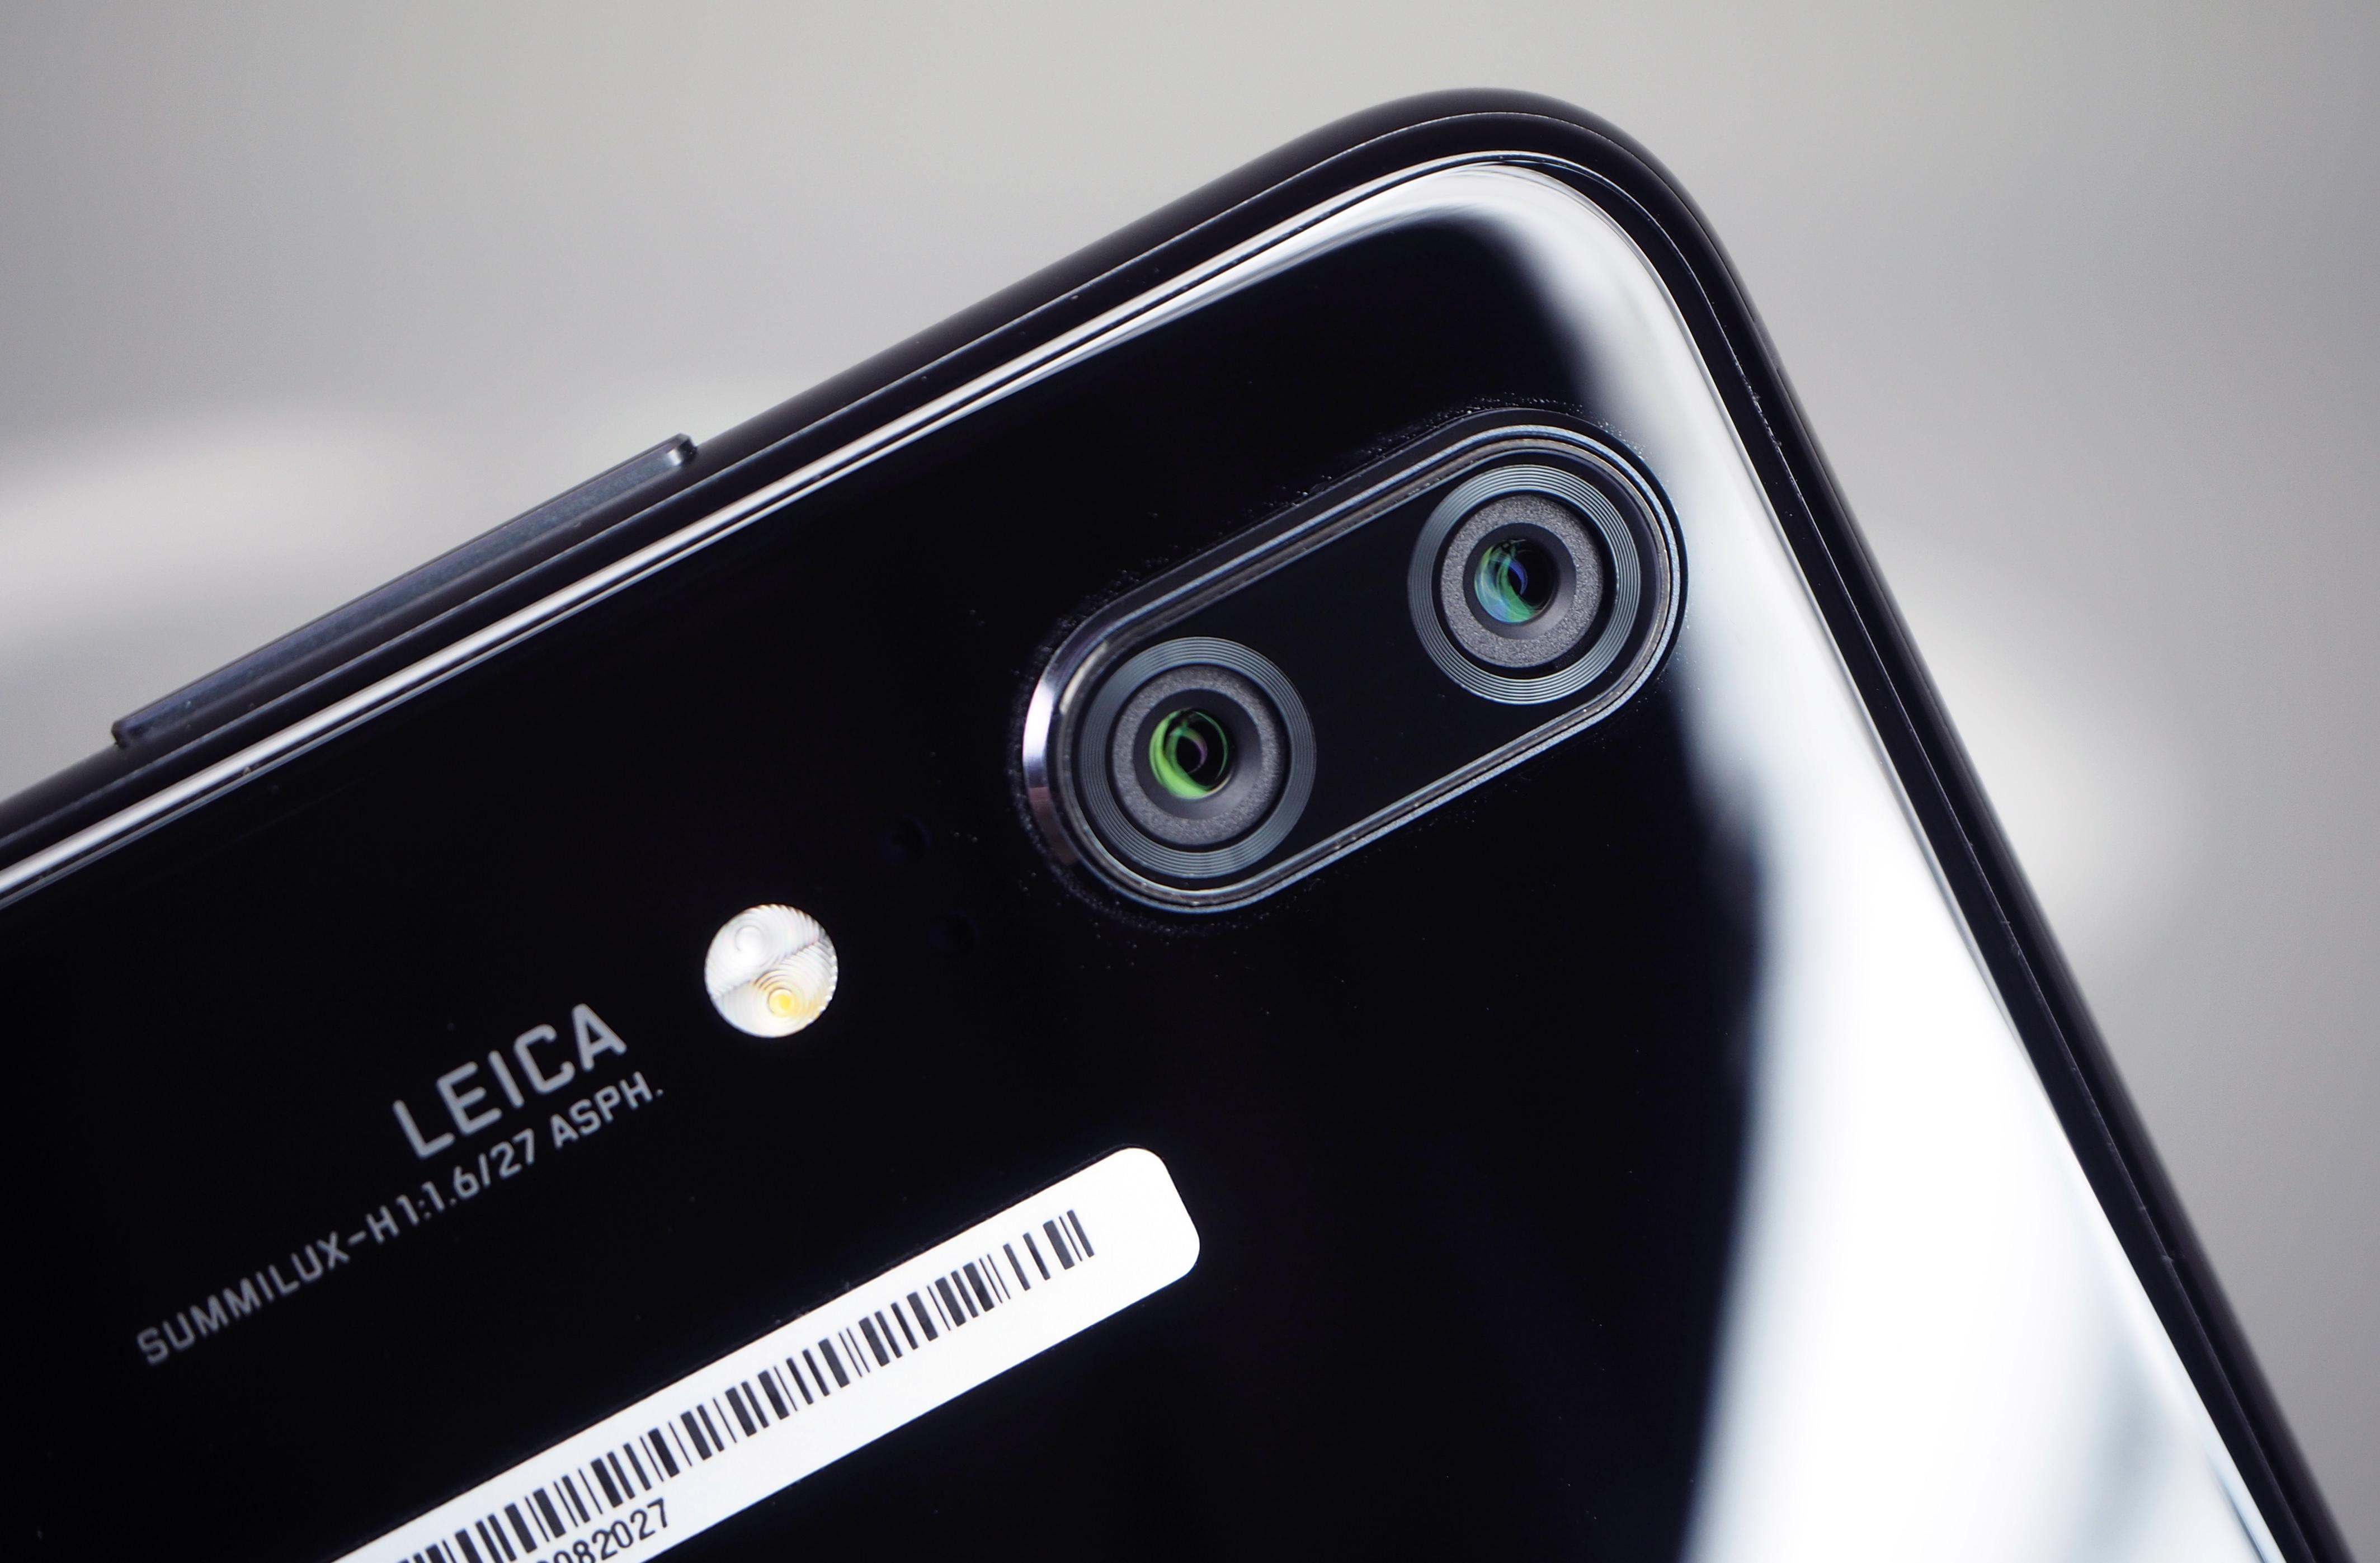 Huawei P20 Leica Smartphone Review | ePHOTOzine